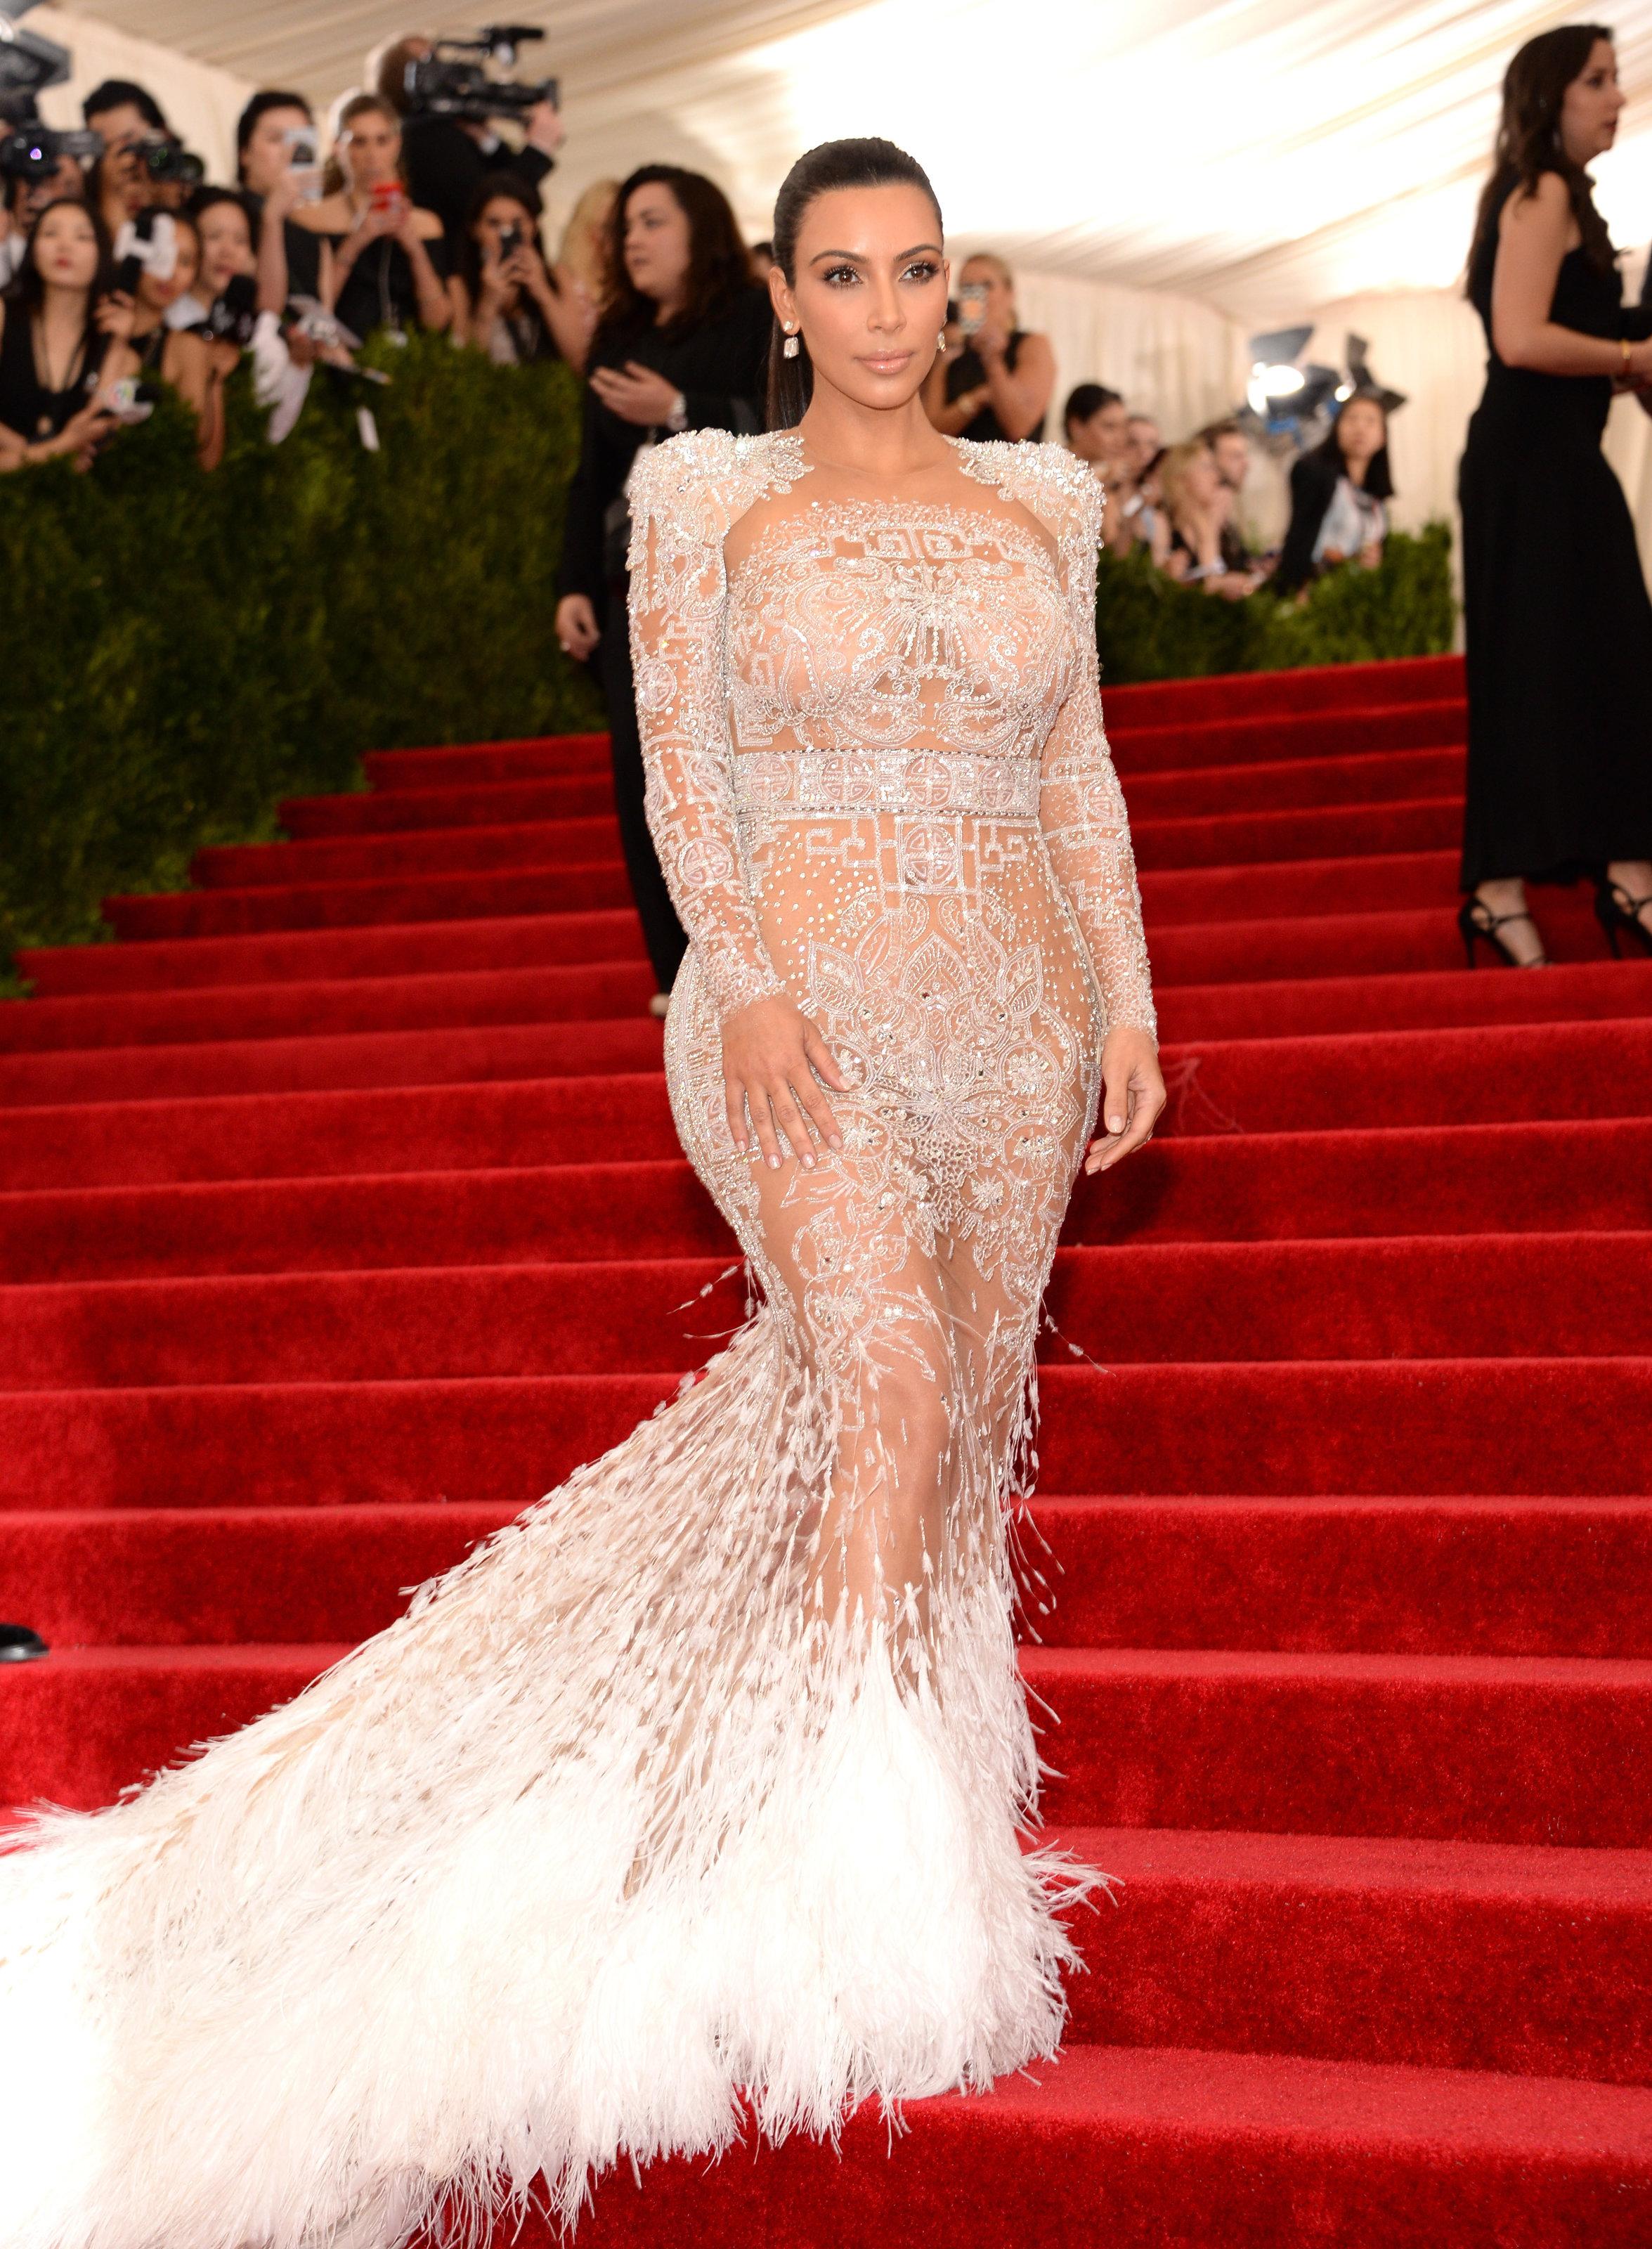 kim-kardashian-west-met-gala-2015-best-dressed